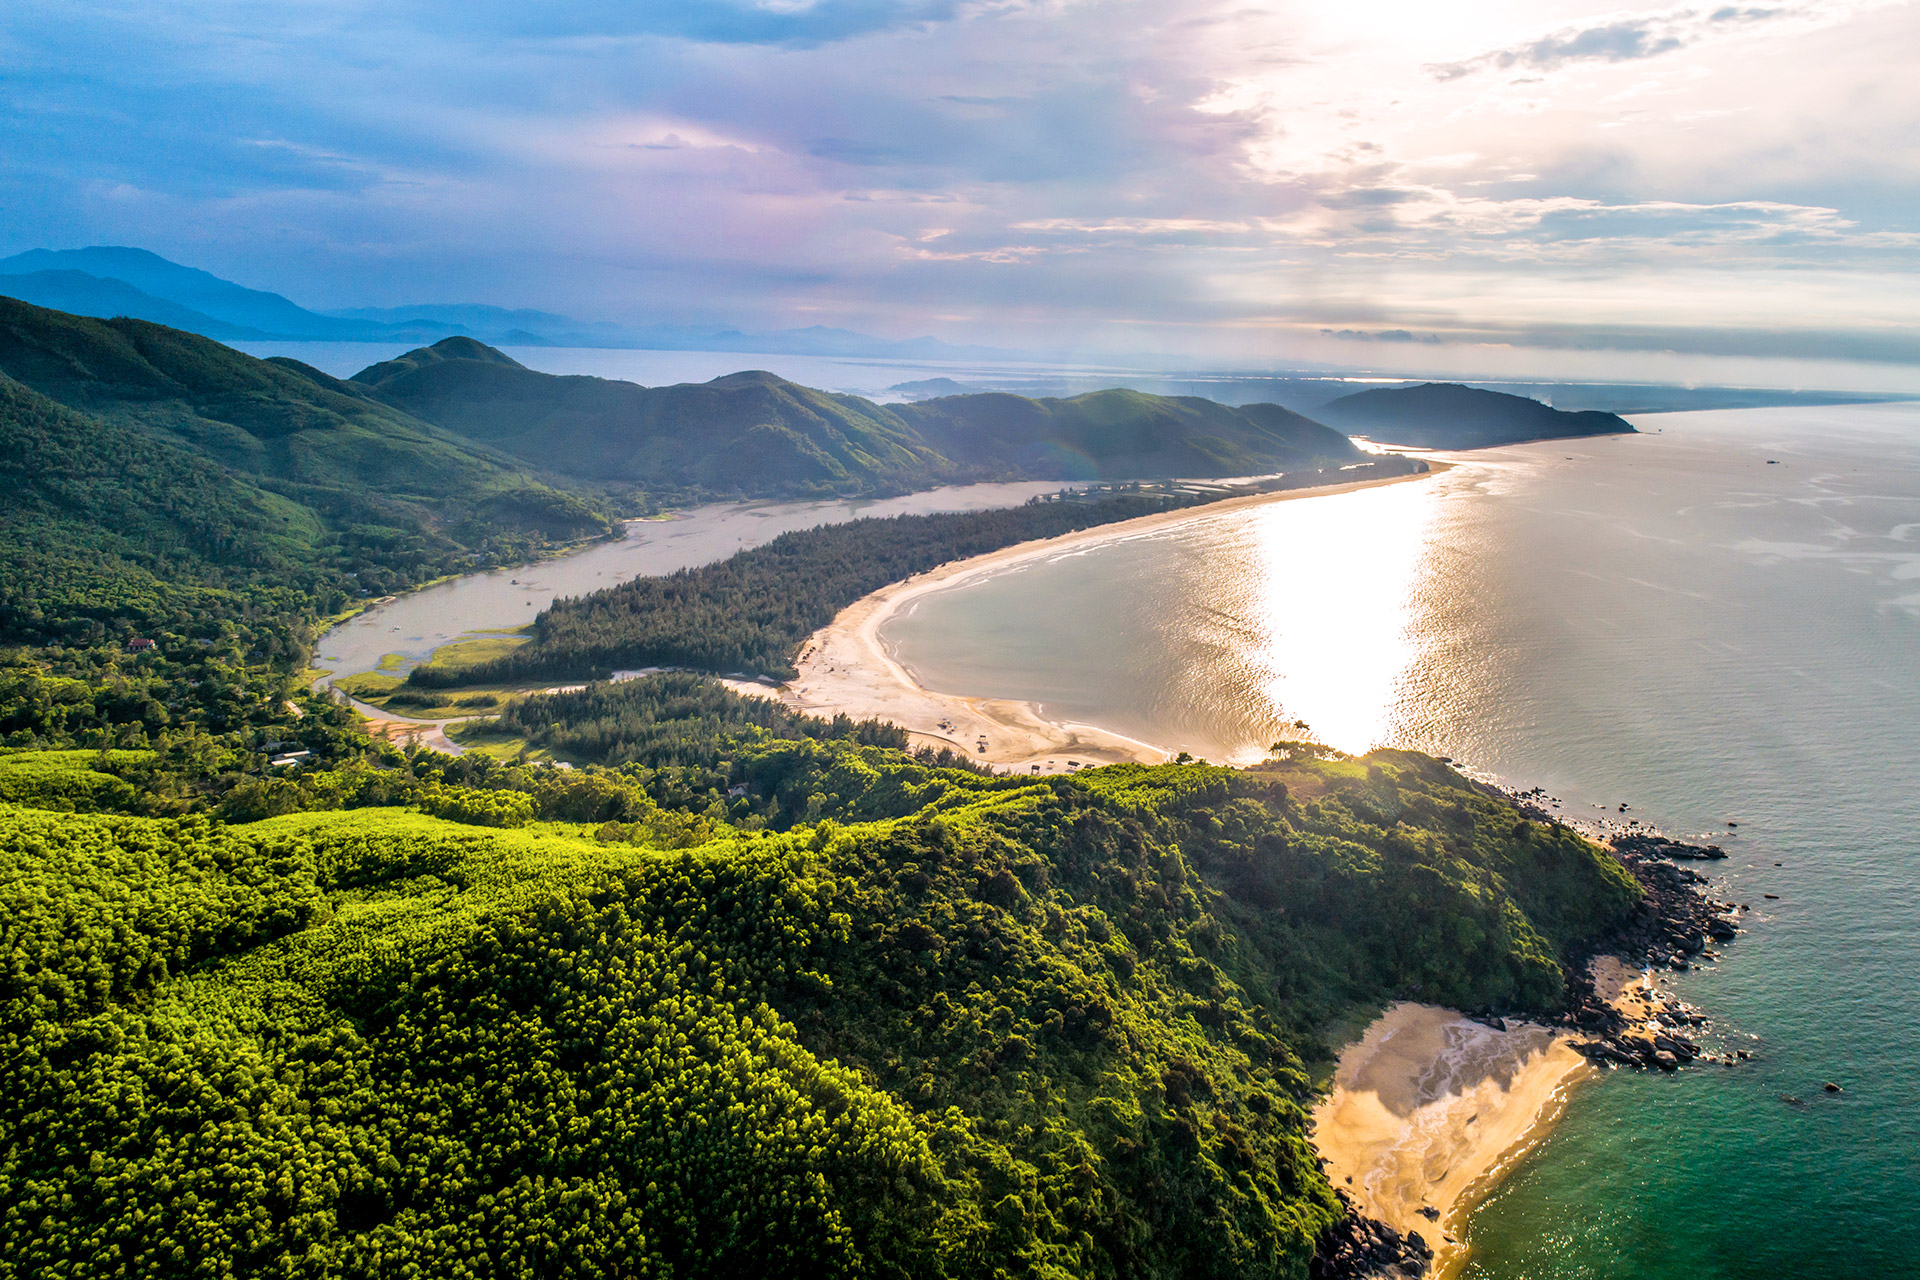 The pristine heaven-like beauty of Lăng Cô Bay